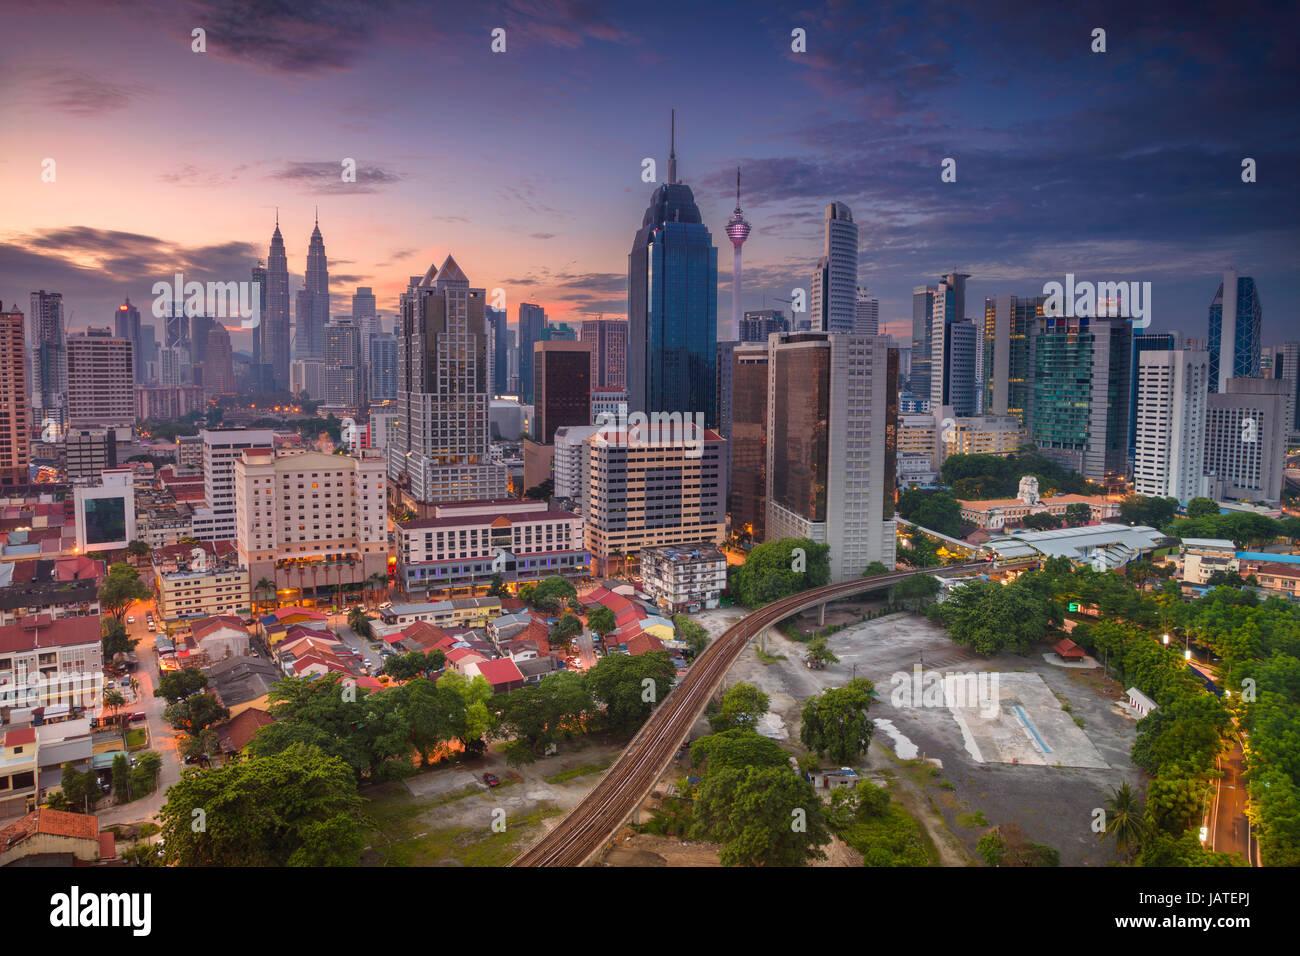 Kuala Lumpur. Imagen del paisaje urbano de Kuala Lumpur, Malasia, durante el amanecer. Imagen De Stock